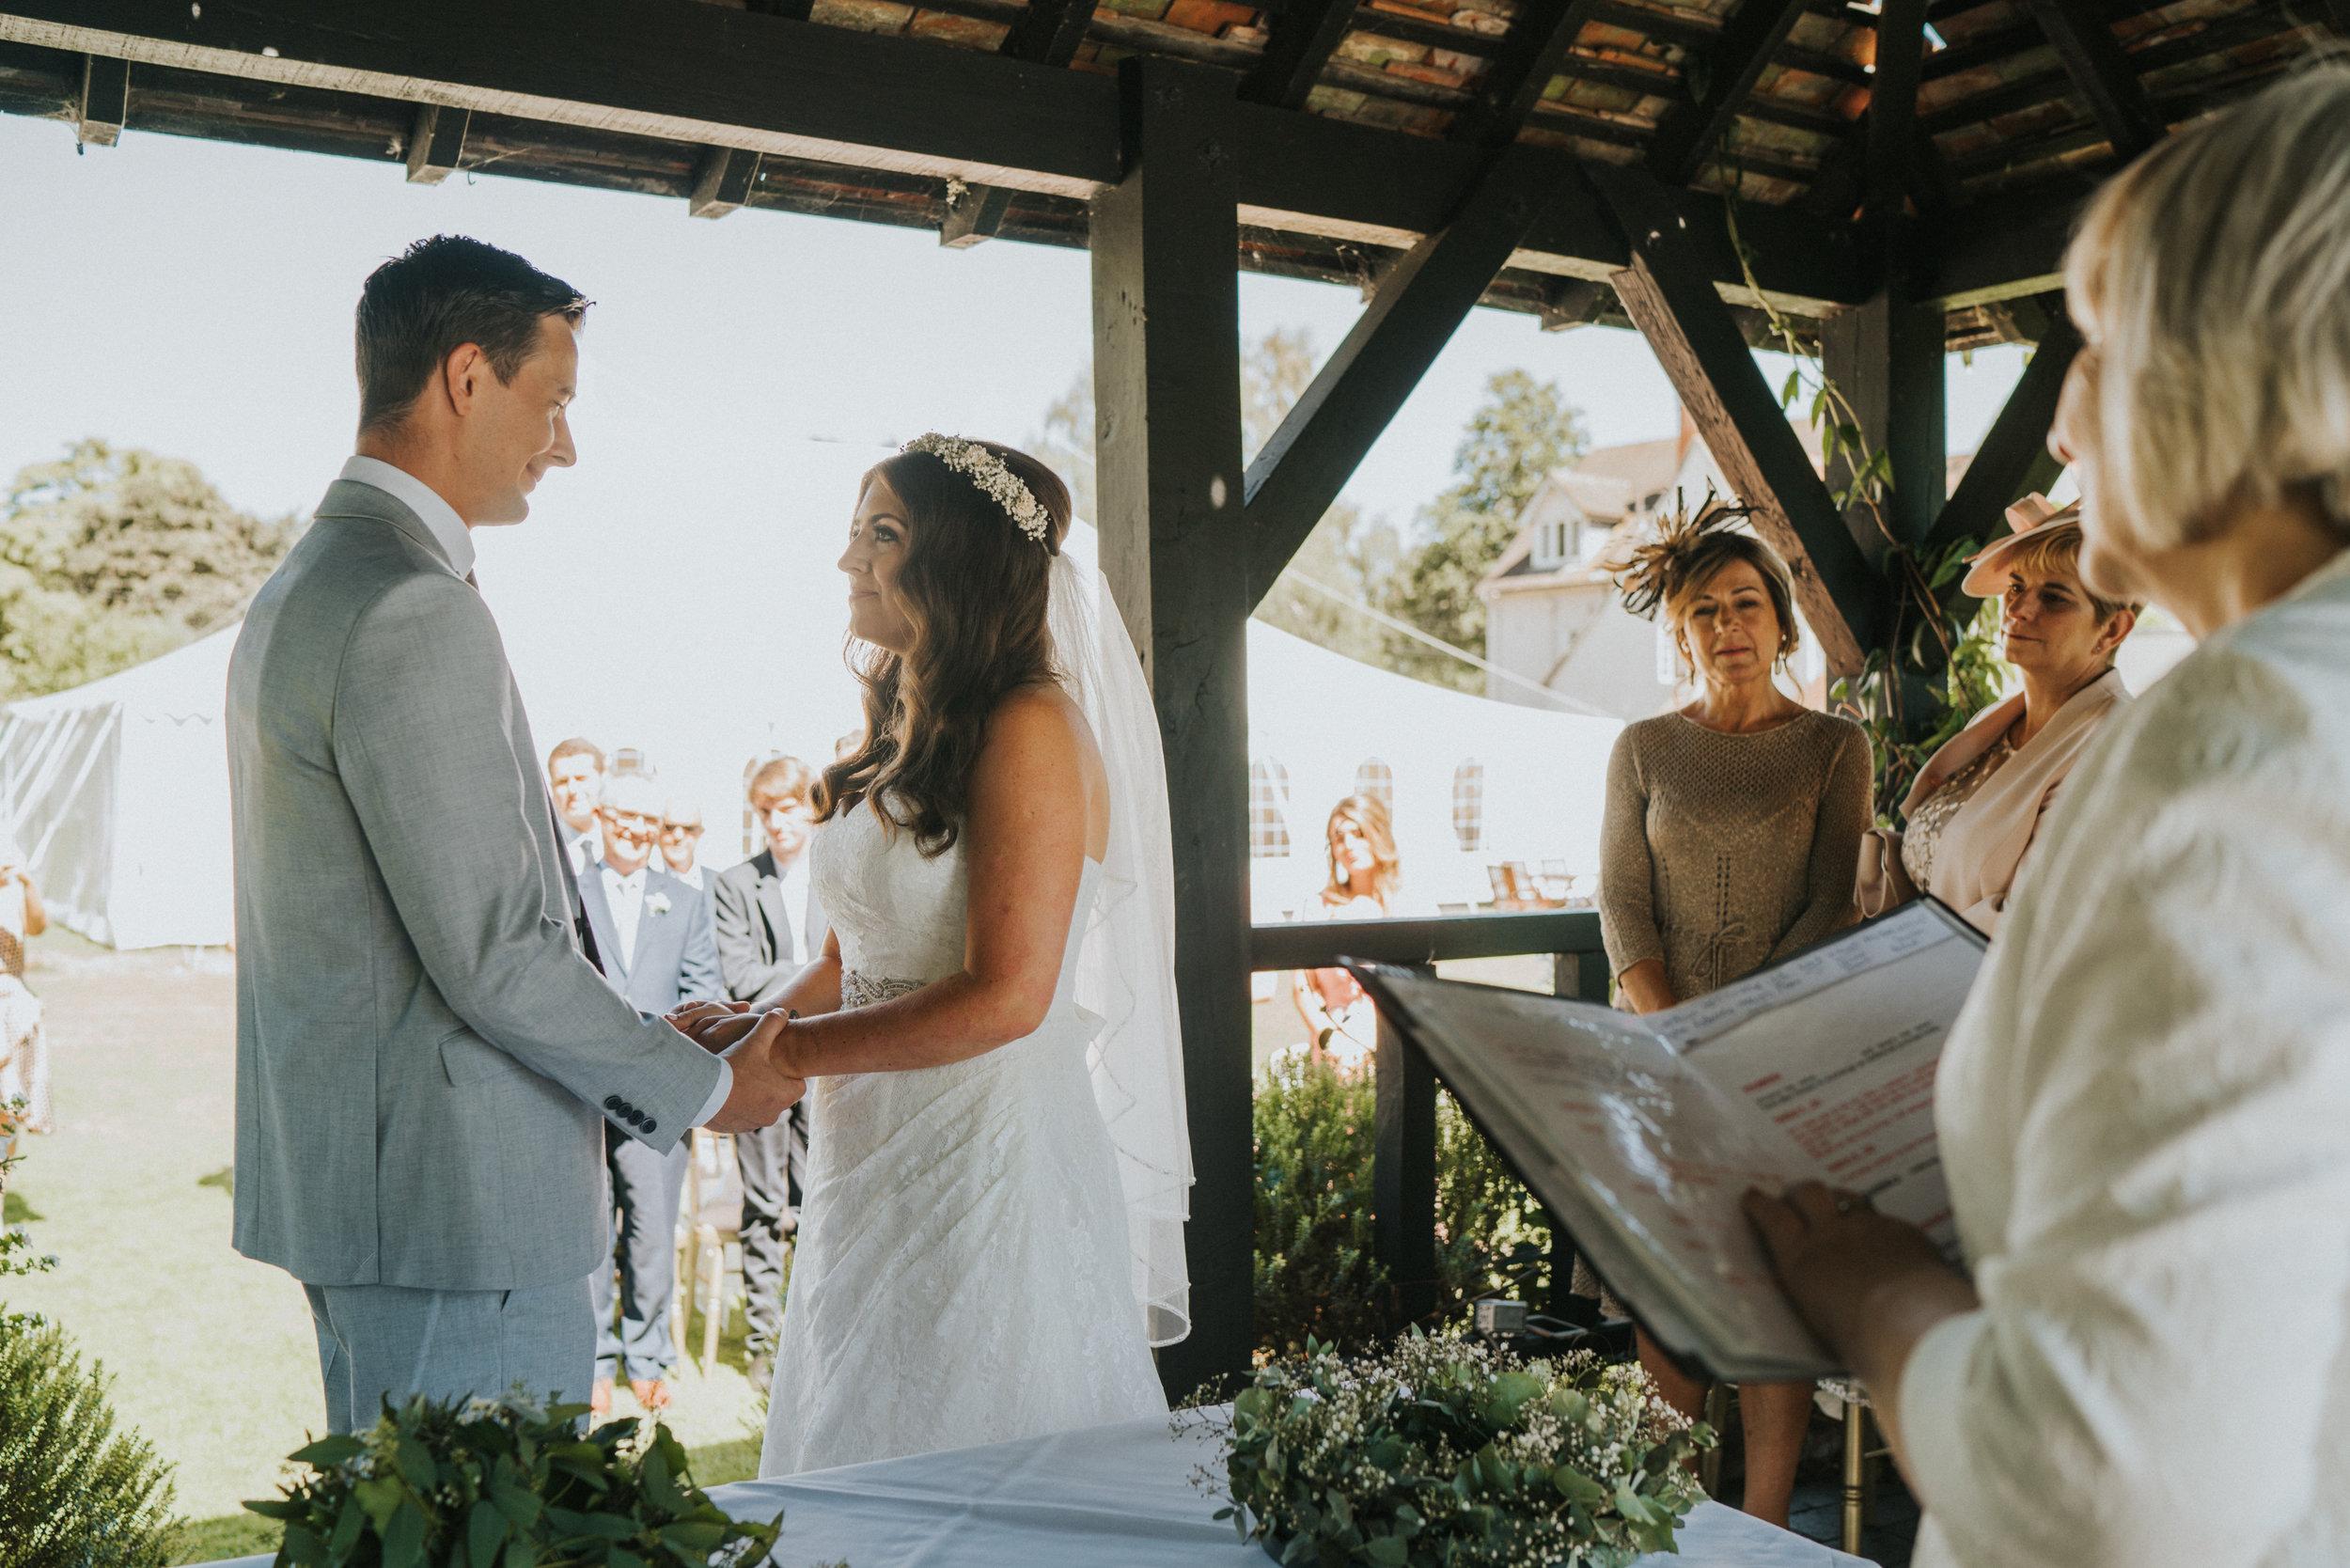 Sophie-Christian-Prested-Hall-Grace-Elizabeth-Previews-Essex-Norfolk-Suffolk-Devon-Alternative-Wedding-Photographer (8 of 20).jpg